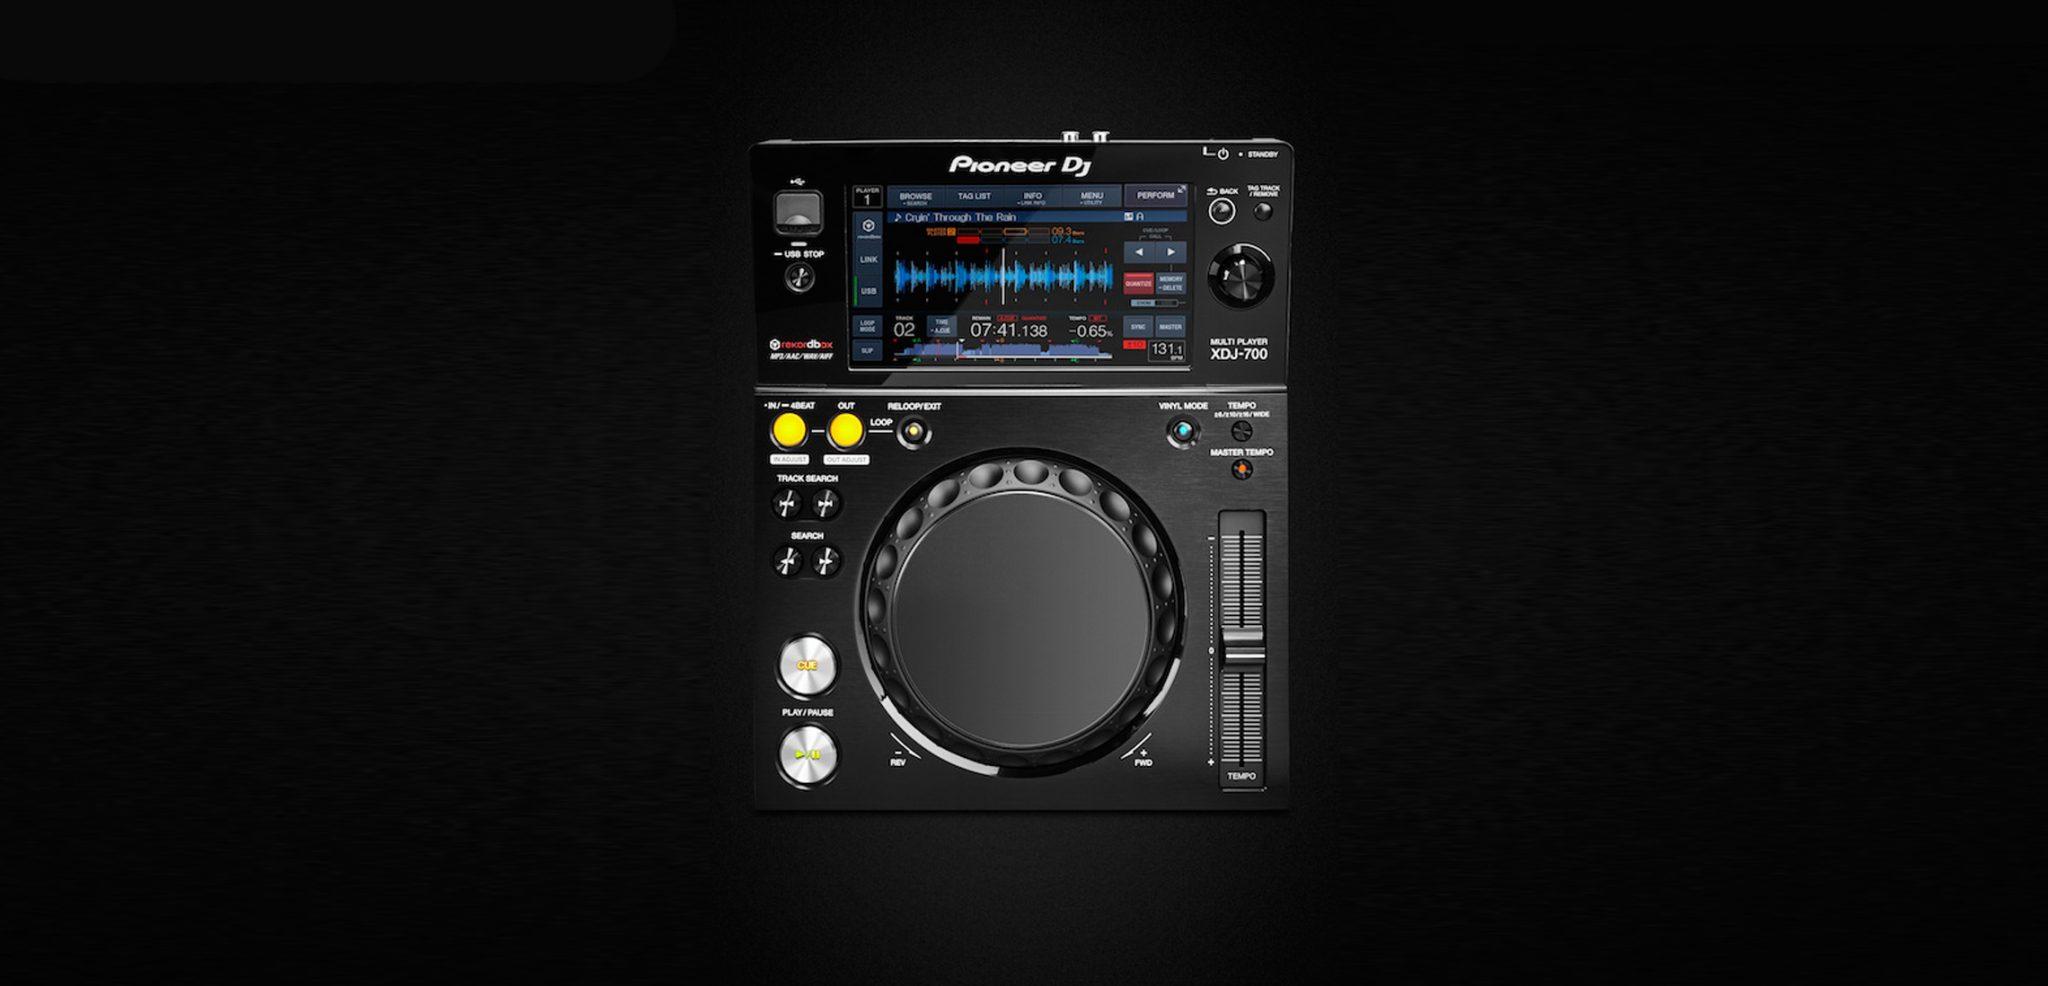 Introducing Pioneer's next digital player: XDJ-700